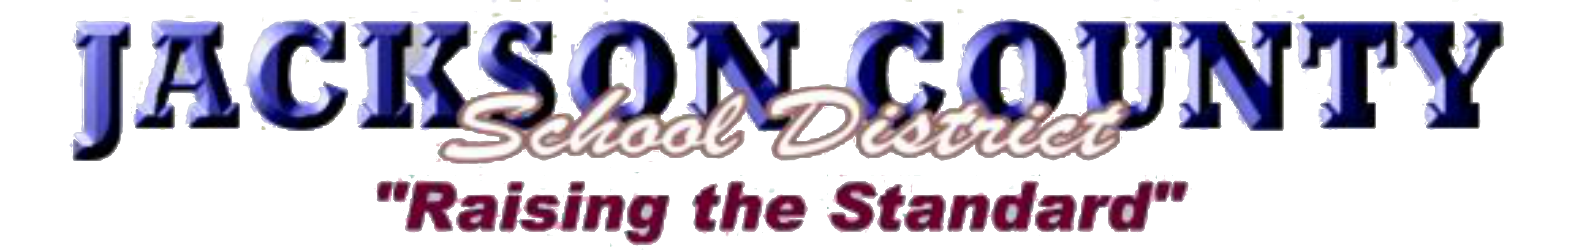 Jackson County School District logo